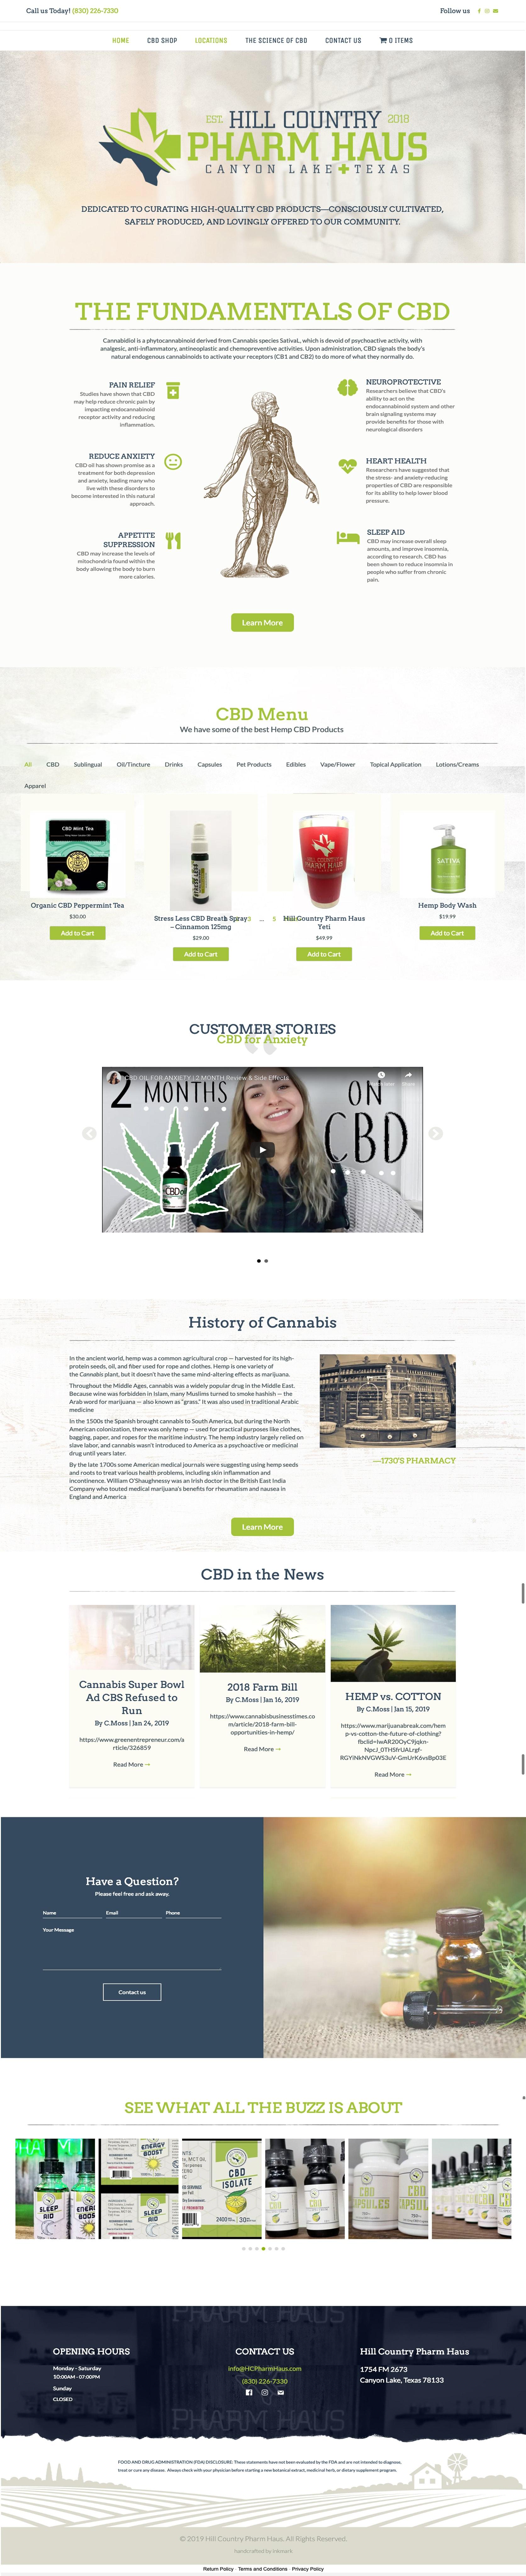 CBD-Web-Design-HC-Pharm-Haus